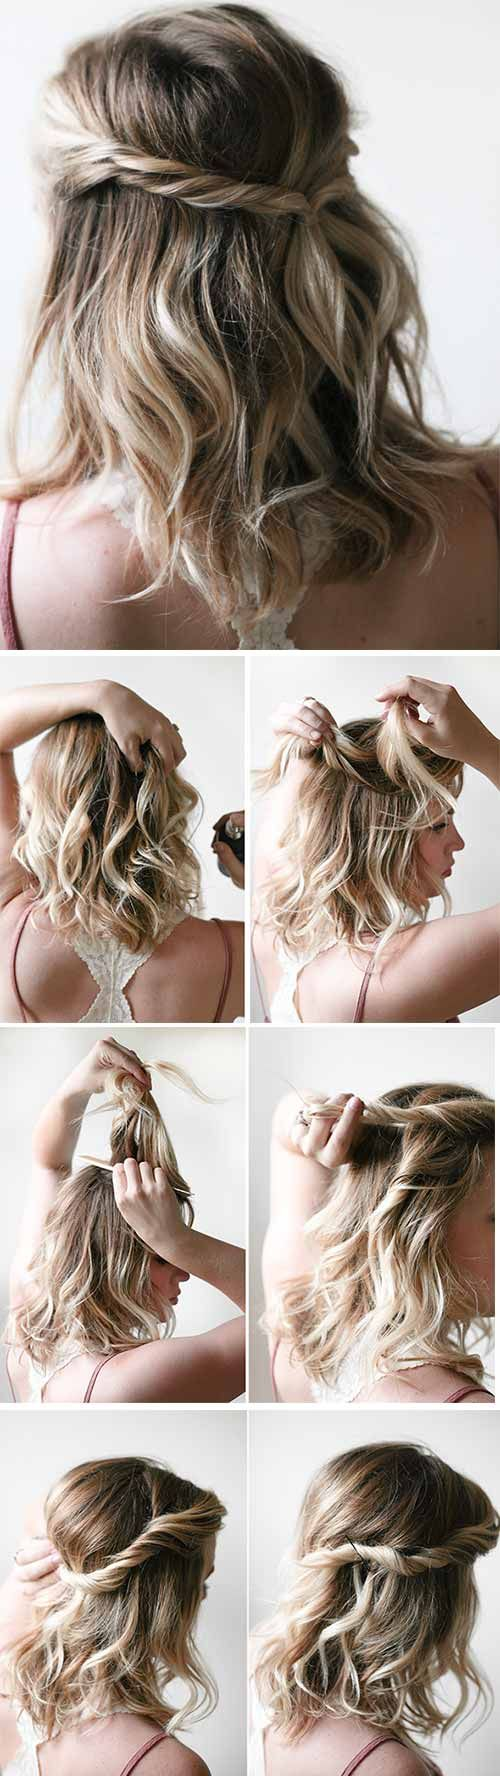 20 Incredible DIY Short Hairstyles   Cute hairstyles for ...